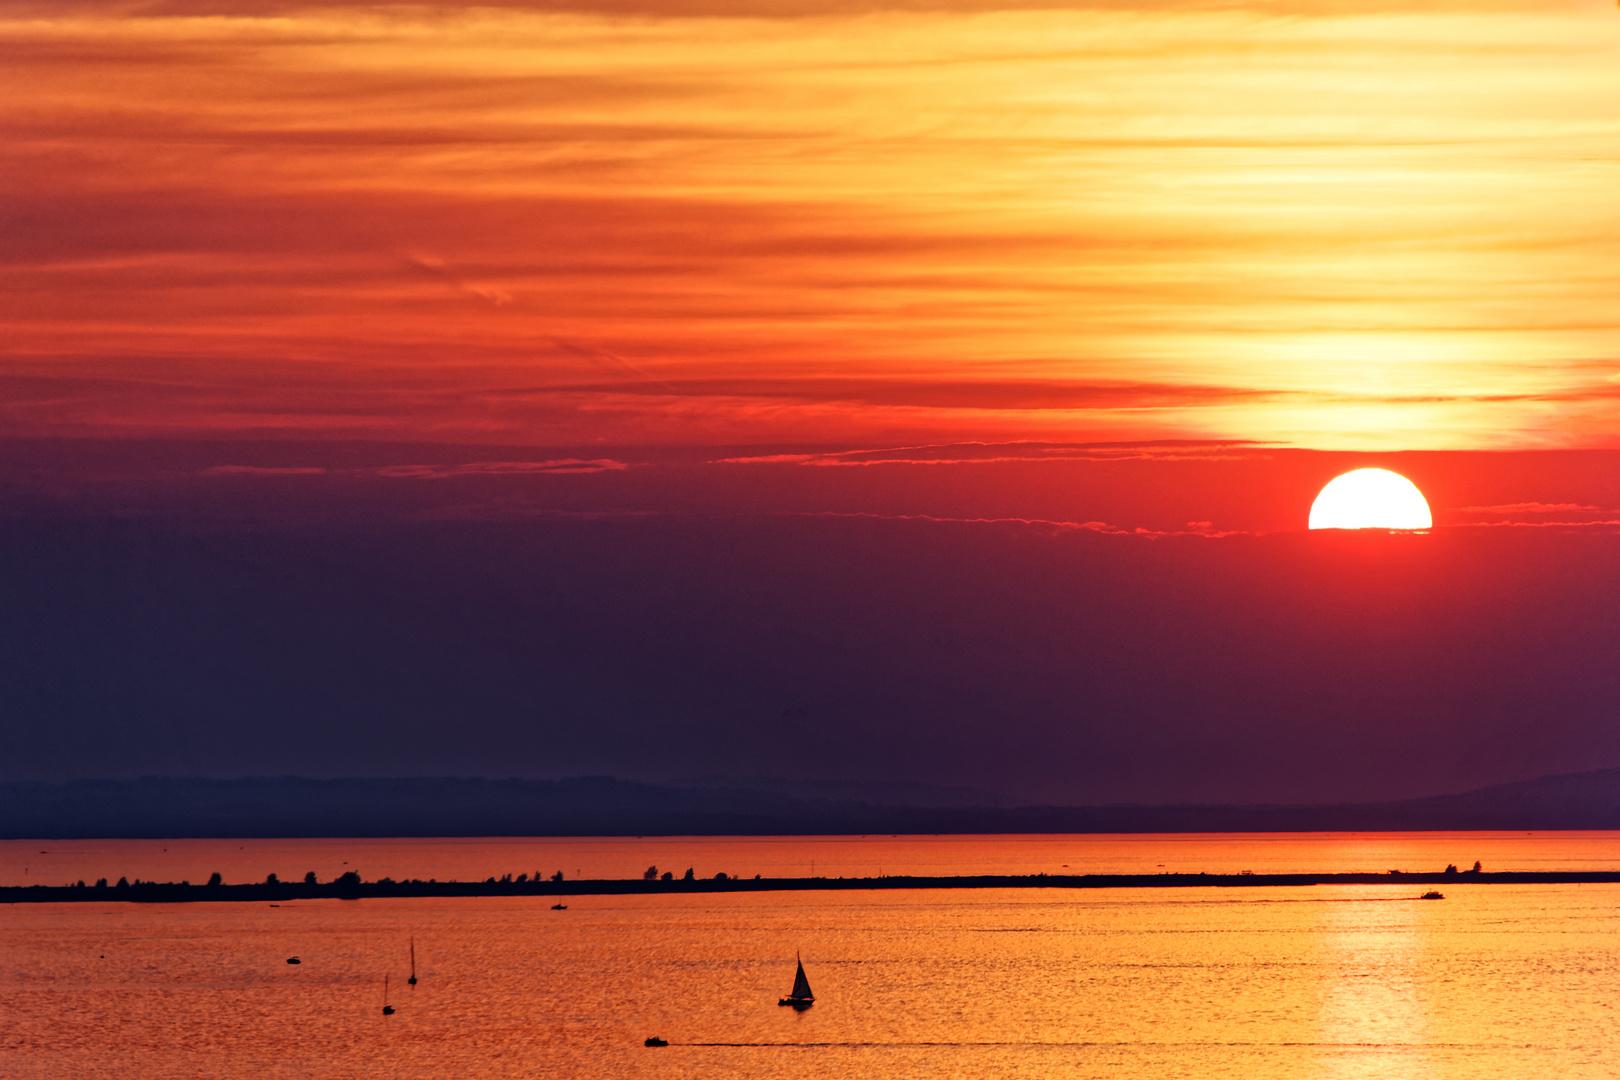 Farbpalette In Orange Foto Bild Farbe Sonnenuntergang Sonne Bilder Auf Fotocommunity